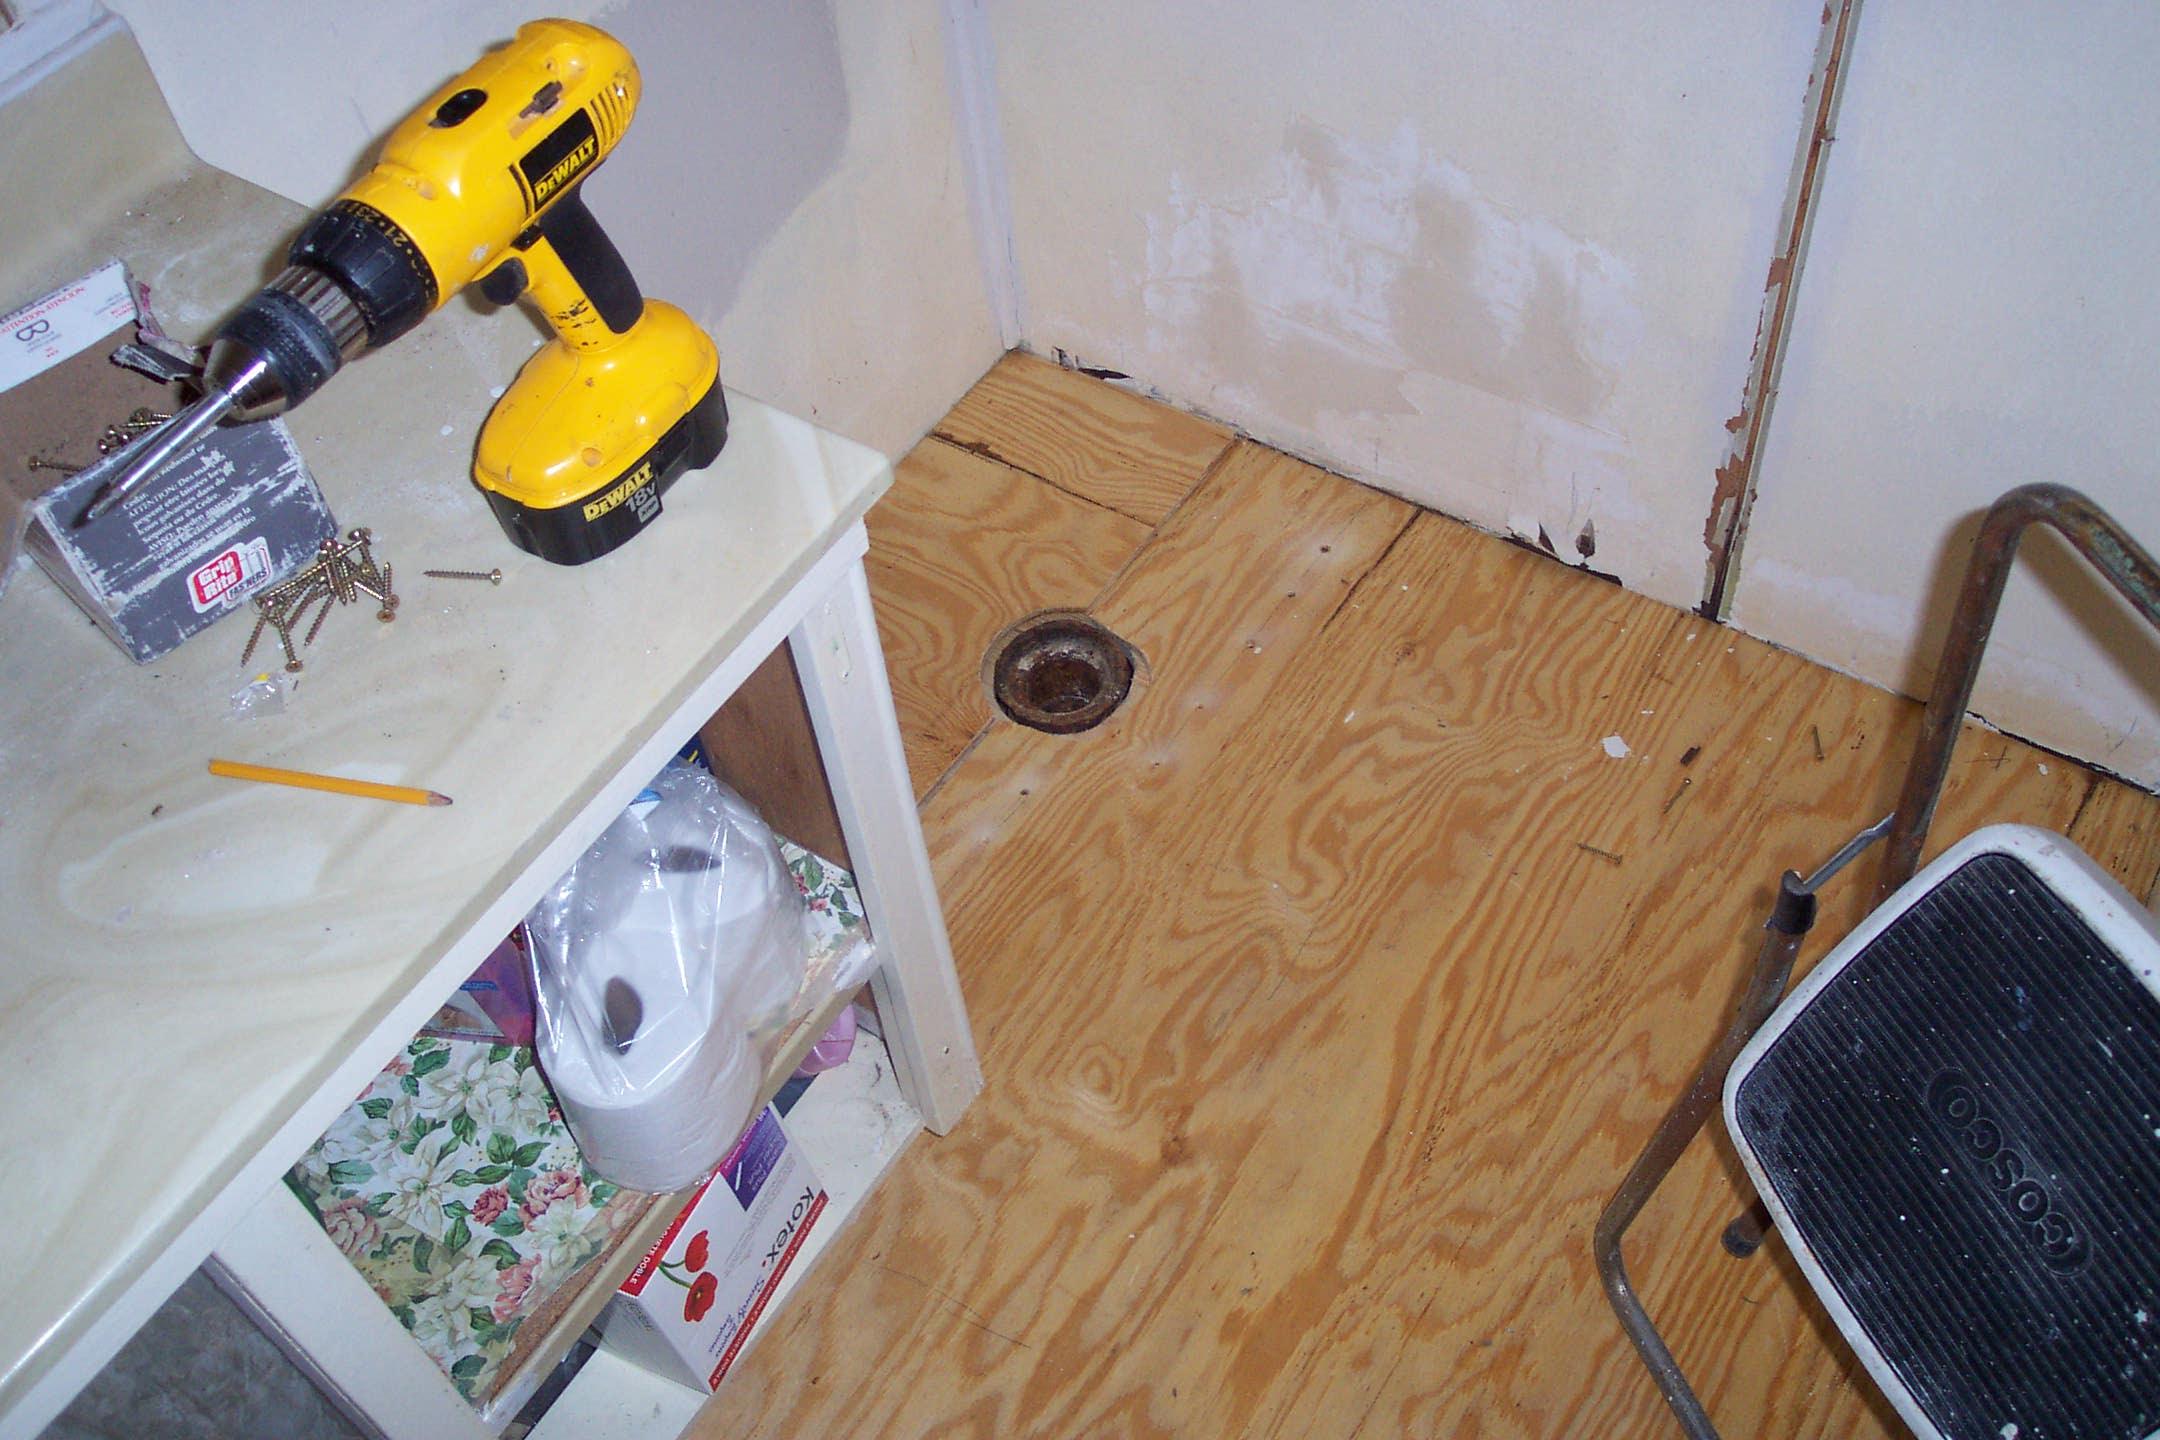 Bathroom wood floor repair and toxic mold pictures for Wood floor refurbishment